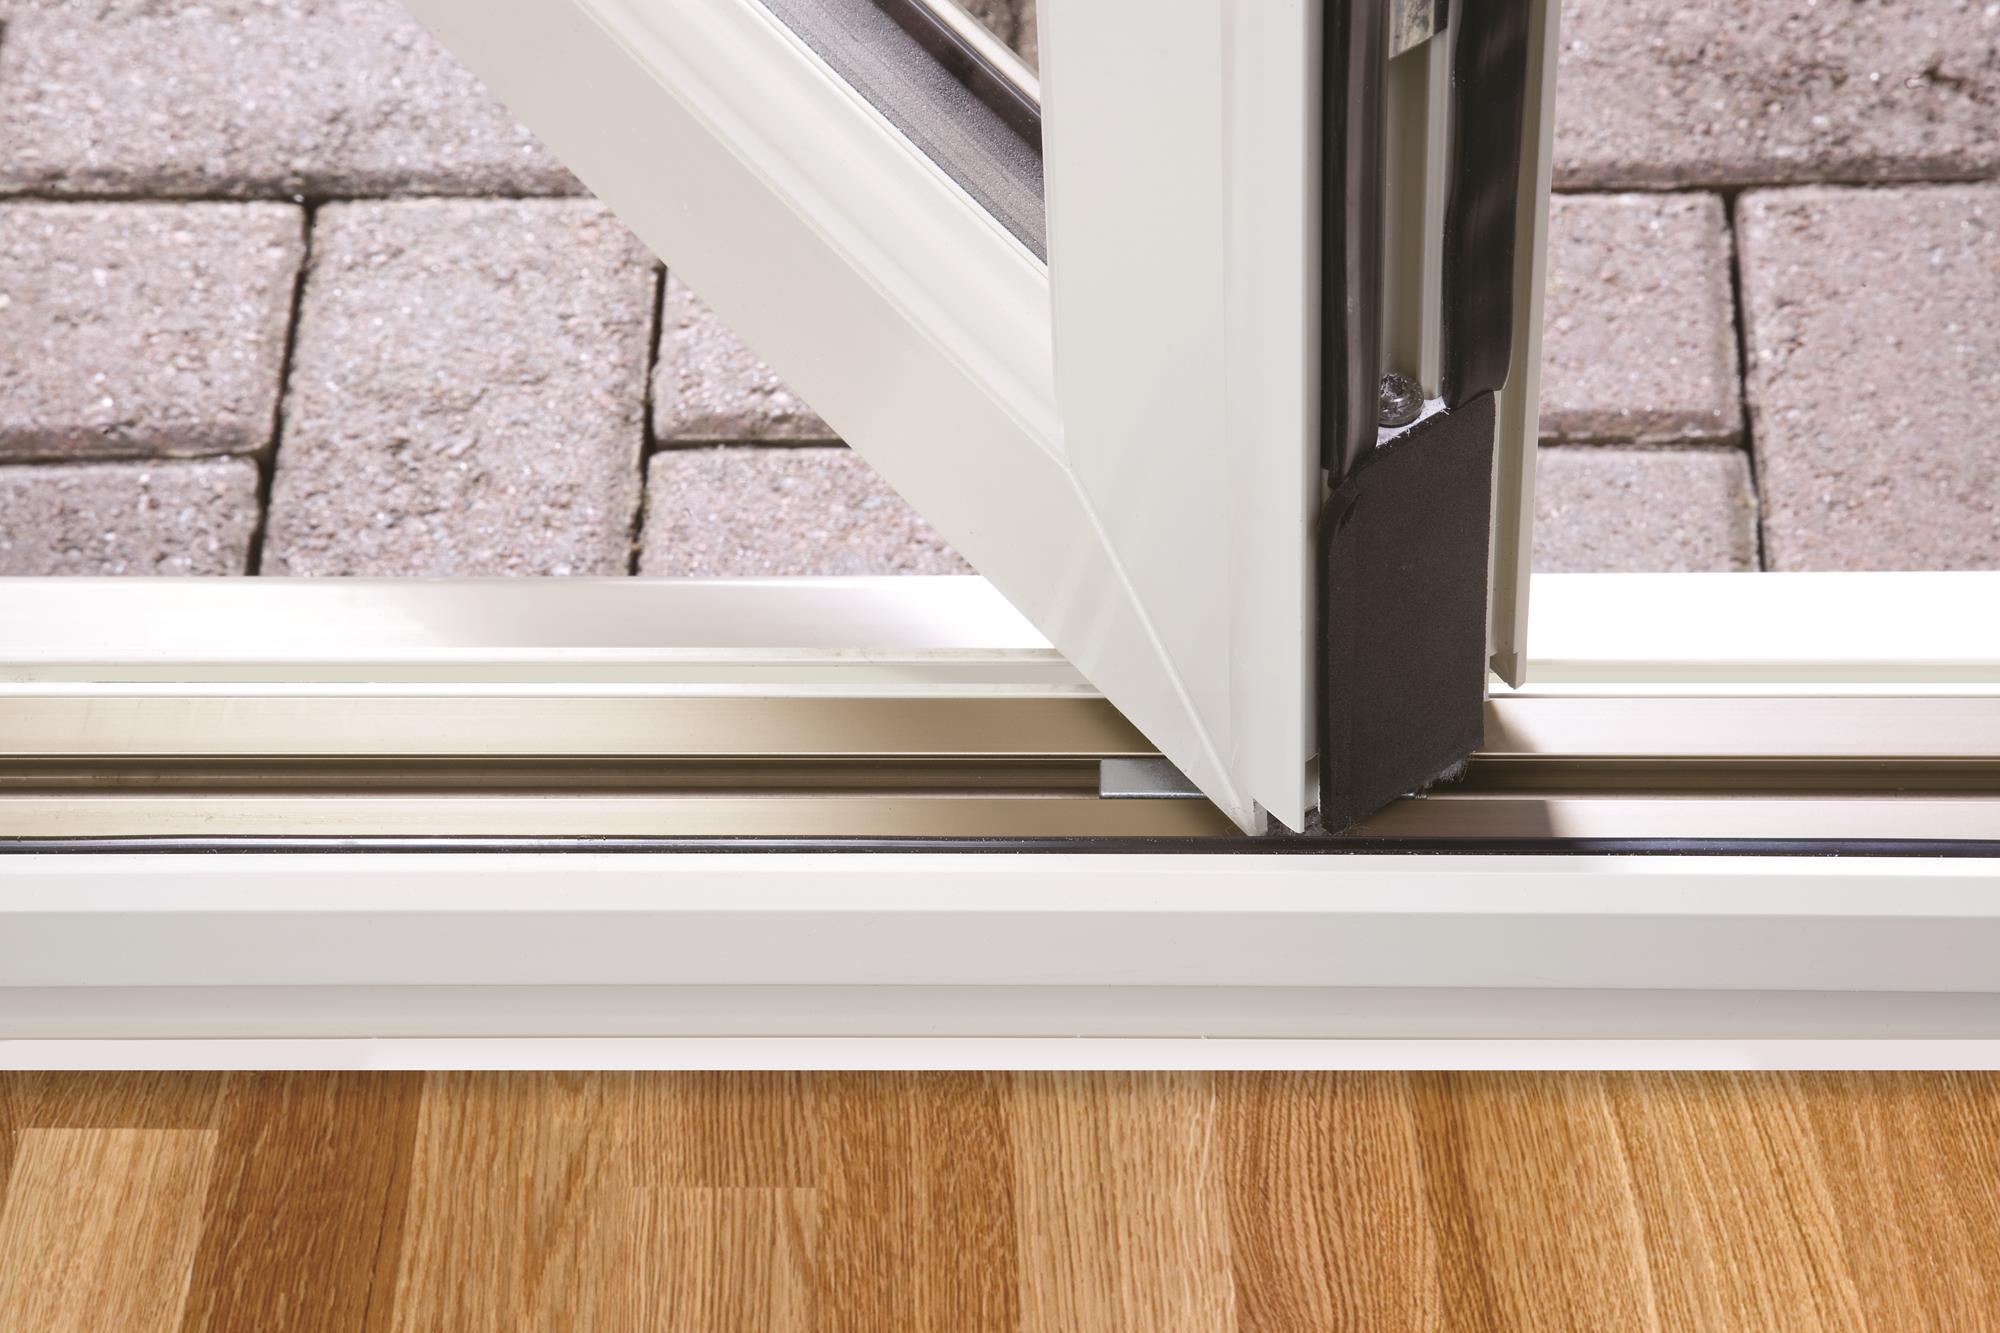 Aspect UPVC Bi-fold Doors - White High Security